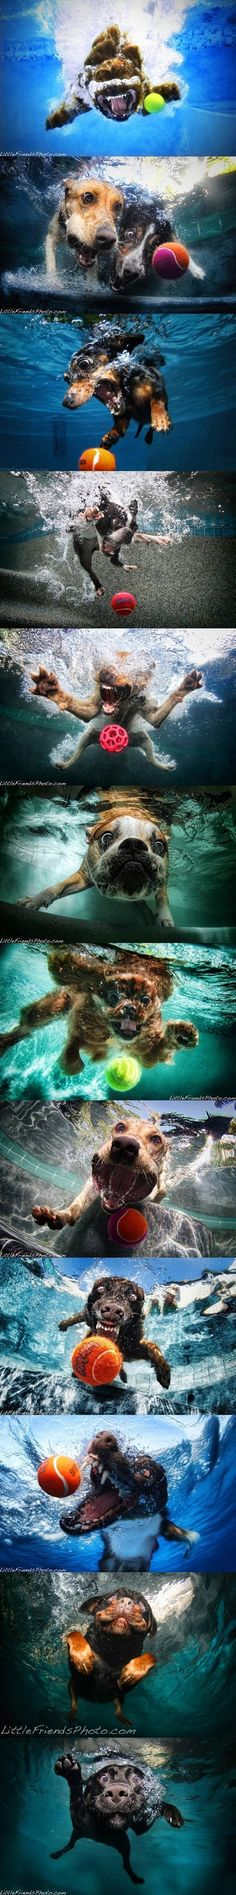 Dogs under water | Postris